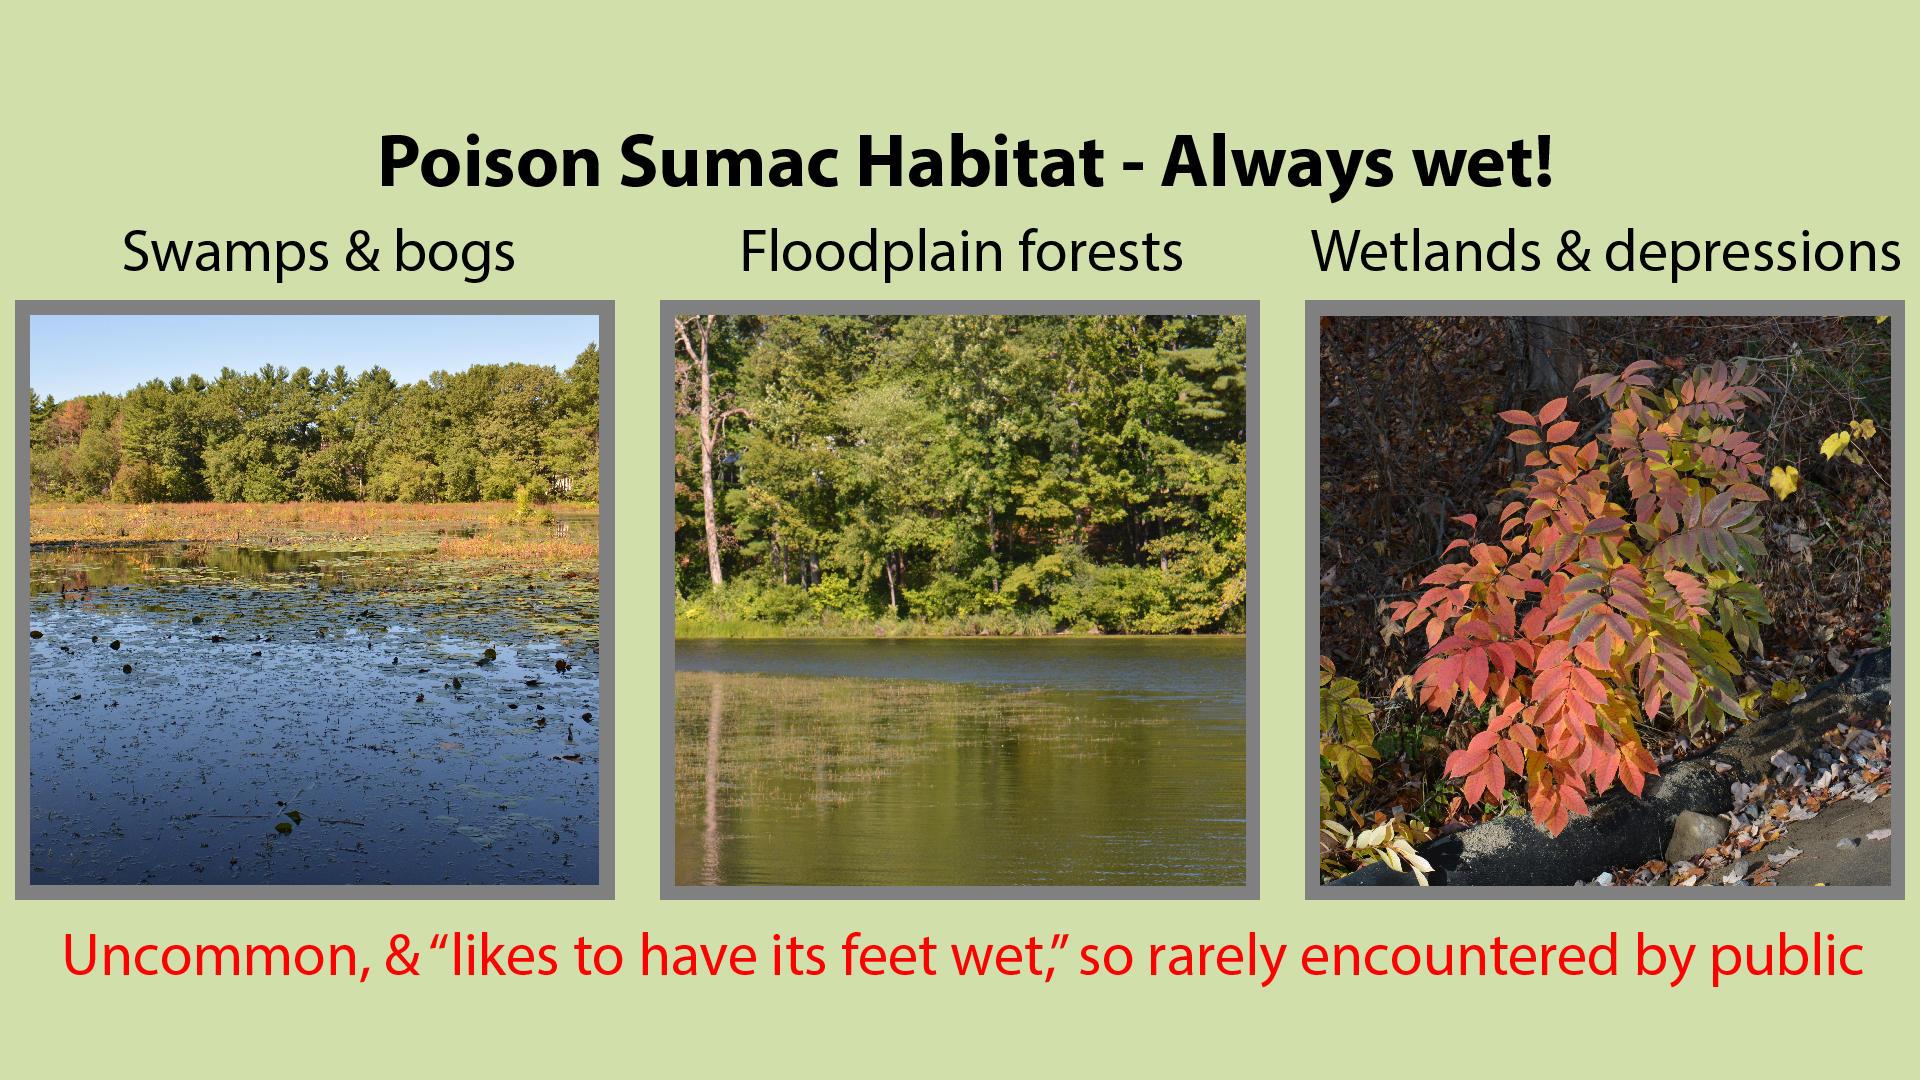 Poison Sumac Habitat